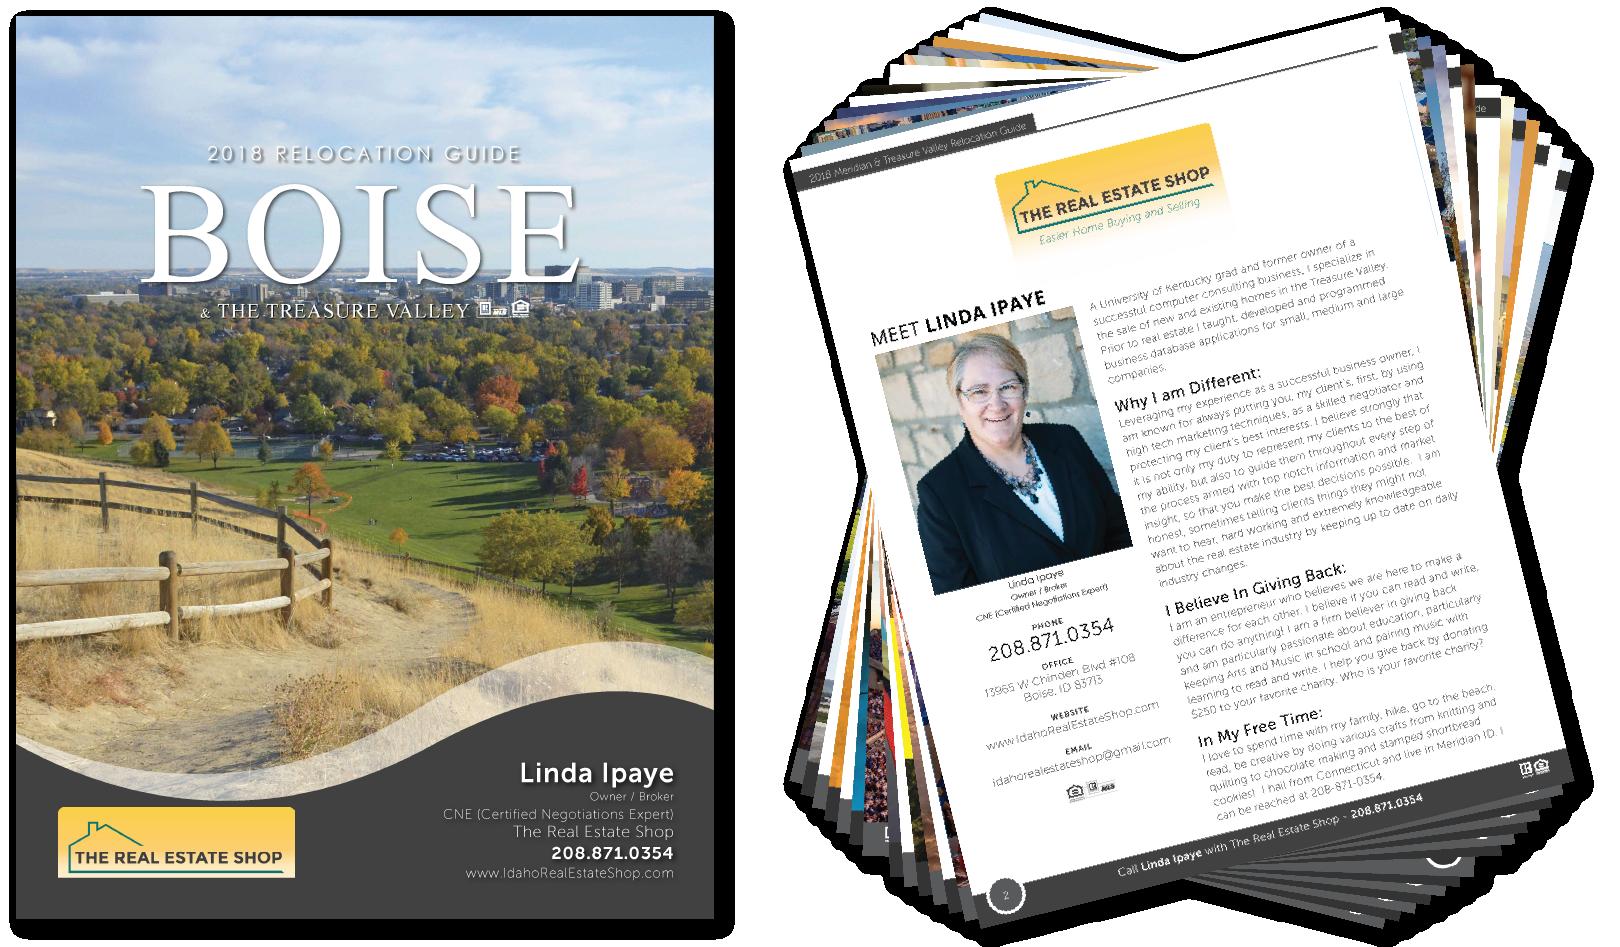 2018 Boise & Treasure Valley Relocation Guide